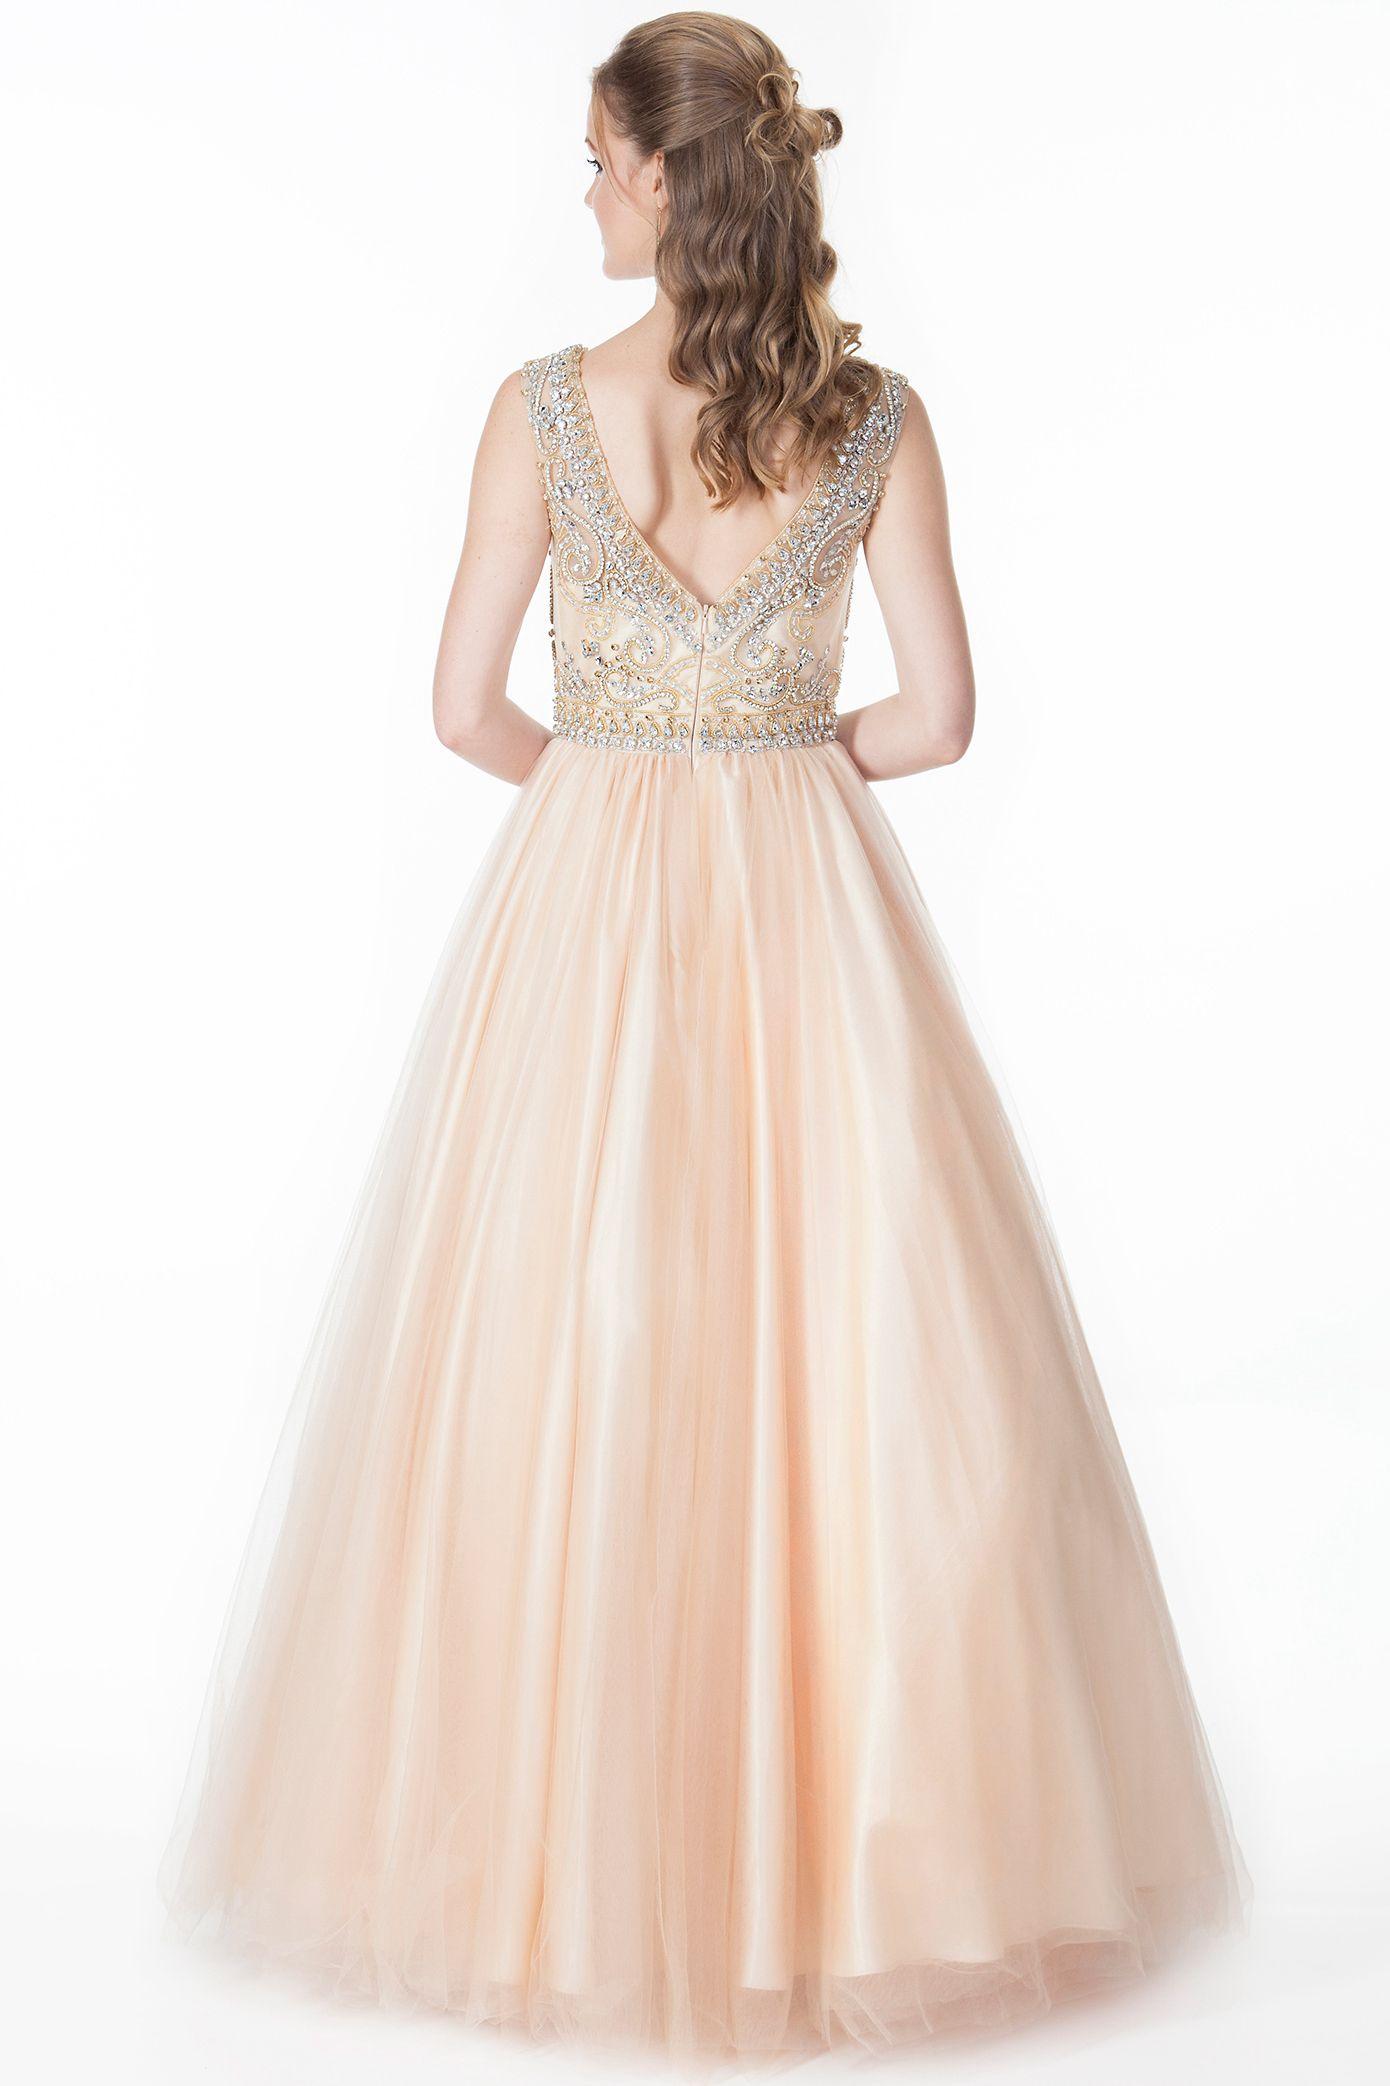 Aline floorlength scoopneck beaded sleeveless tulleusatin prom